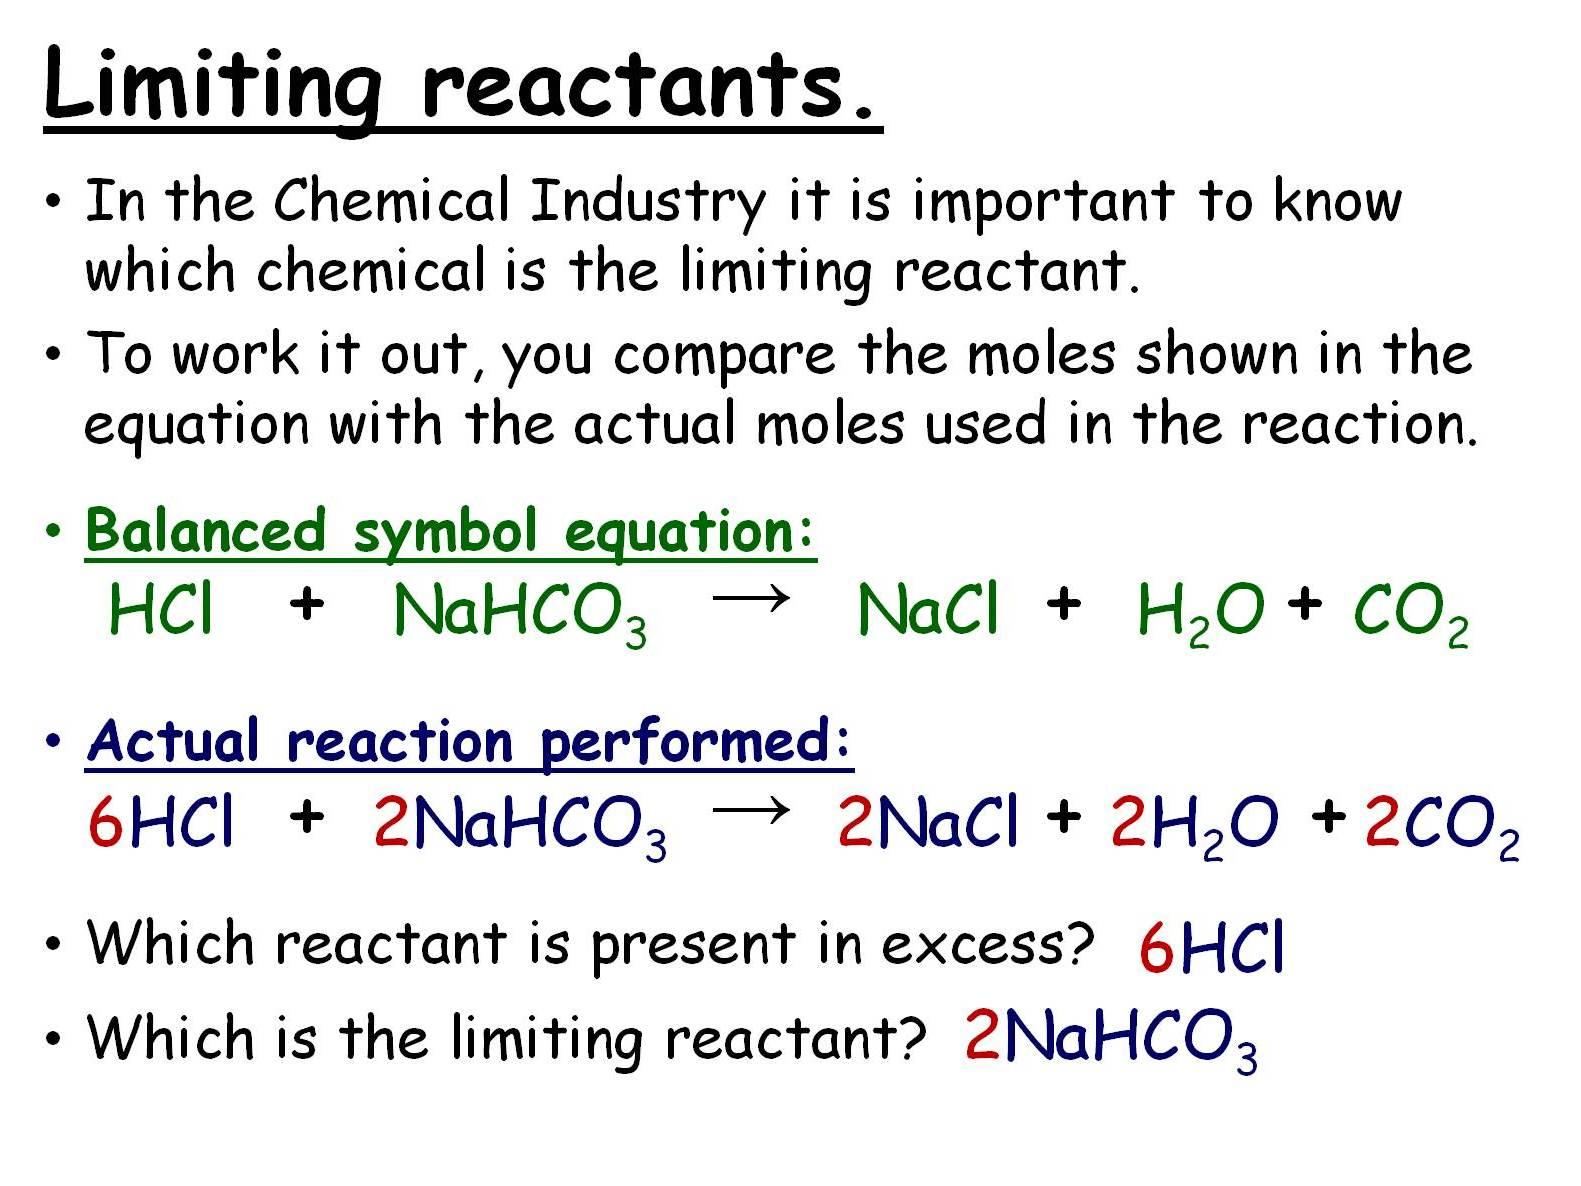 Calculations Involving Masses: 5 GCSE Chemistry Lessons. Edexcel 9-1 Topic CC9 SC9